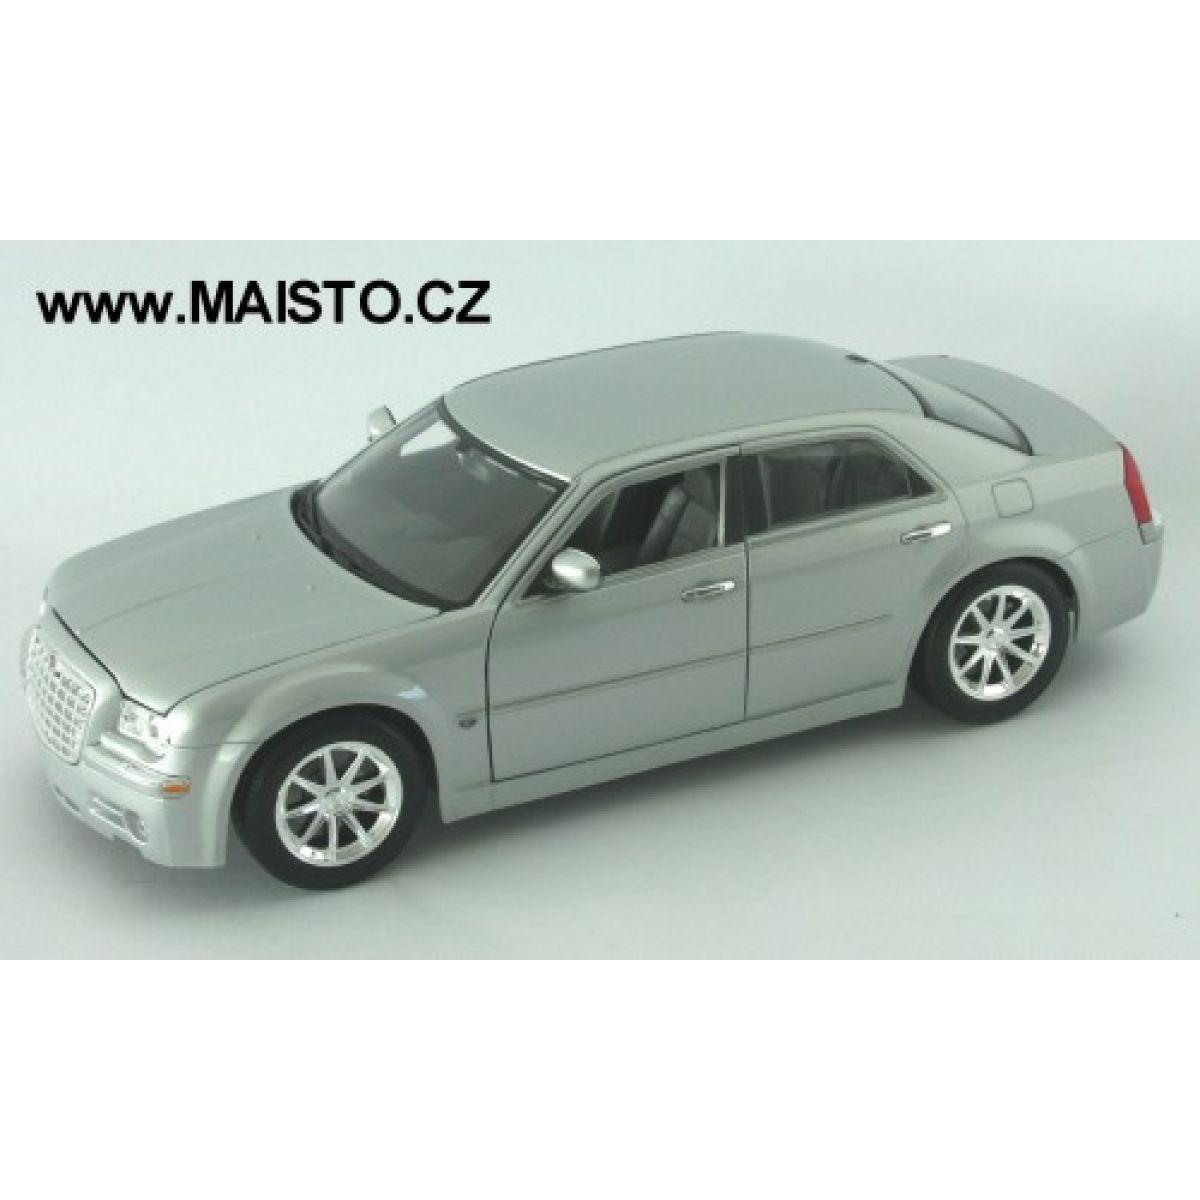 2005 Chrysler 300C Hemi 1:18 Maisto